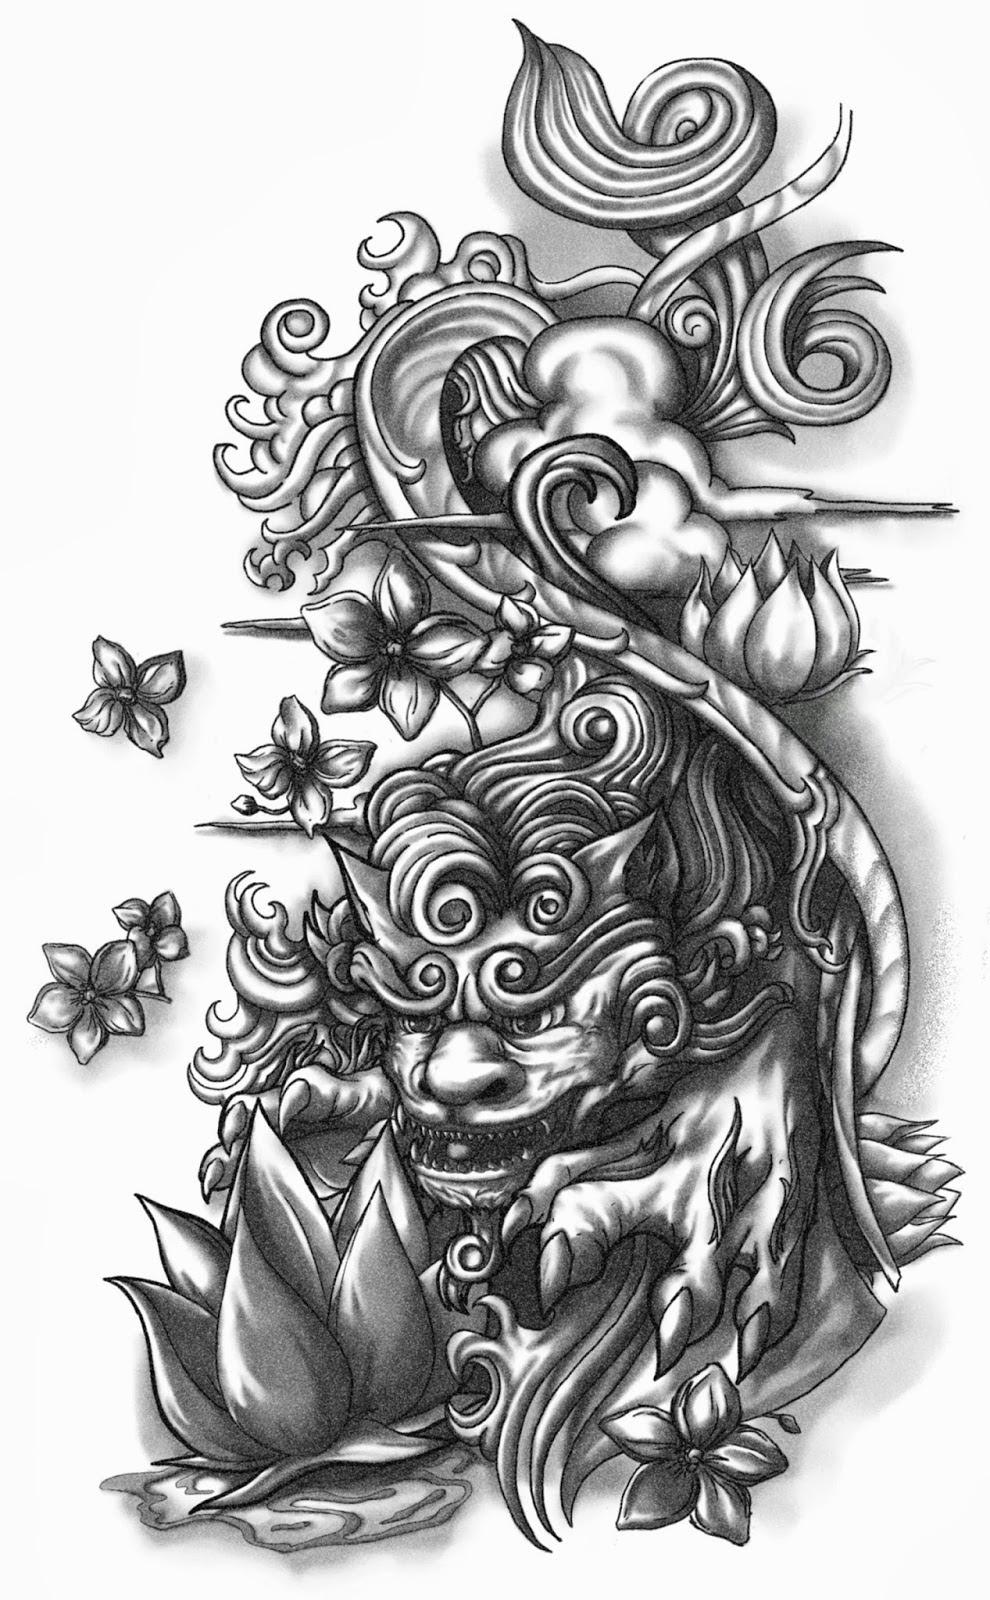 Shisa Dog Half Sleeve Tattoo Design By CrisLuspoTattoos On